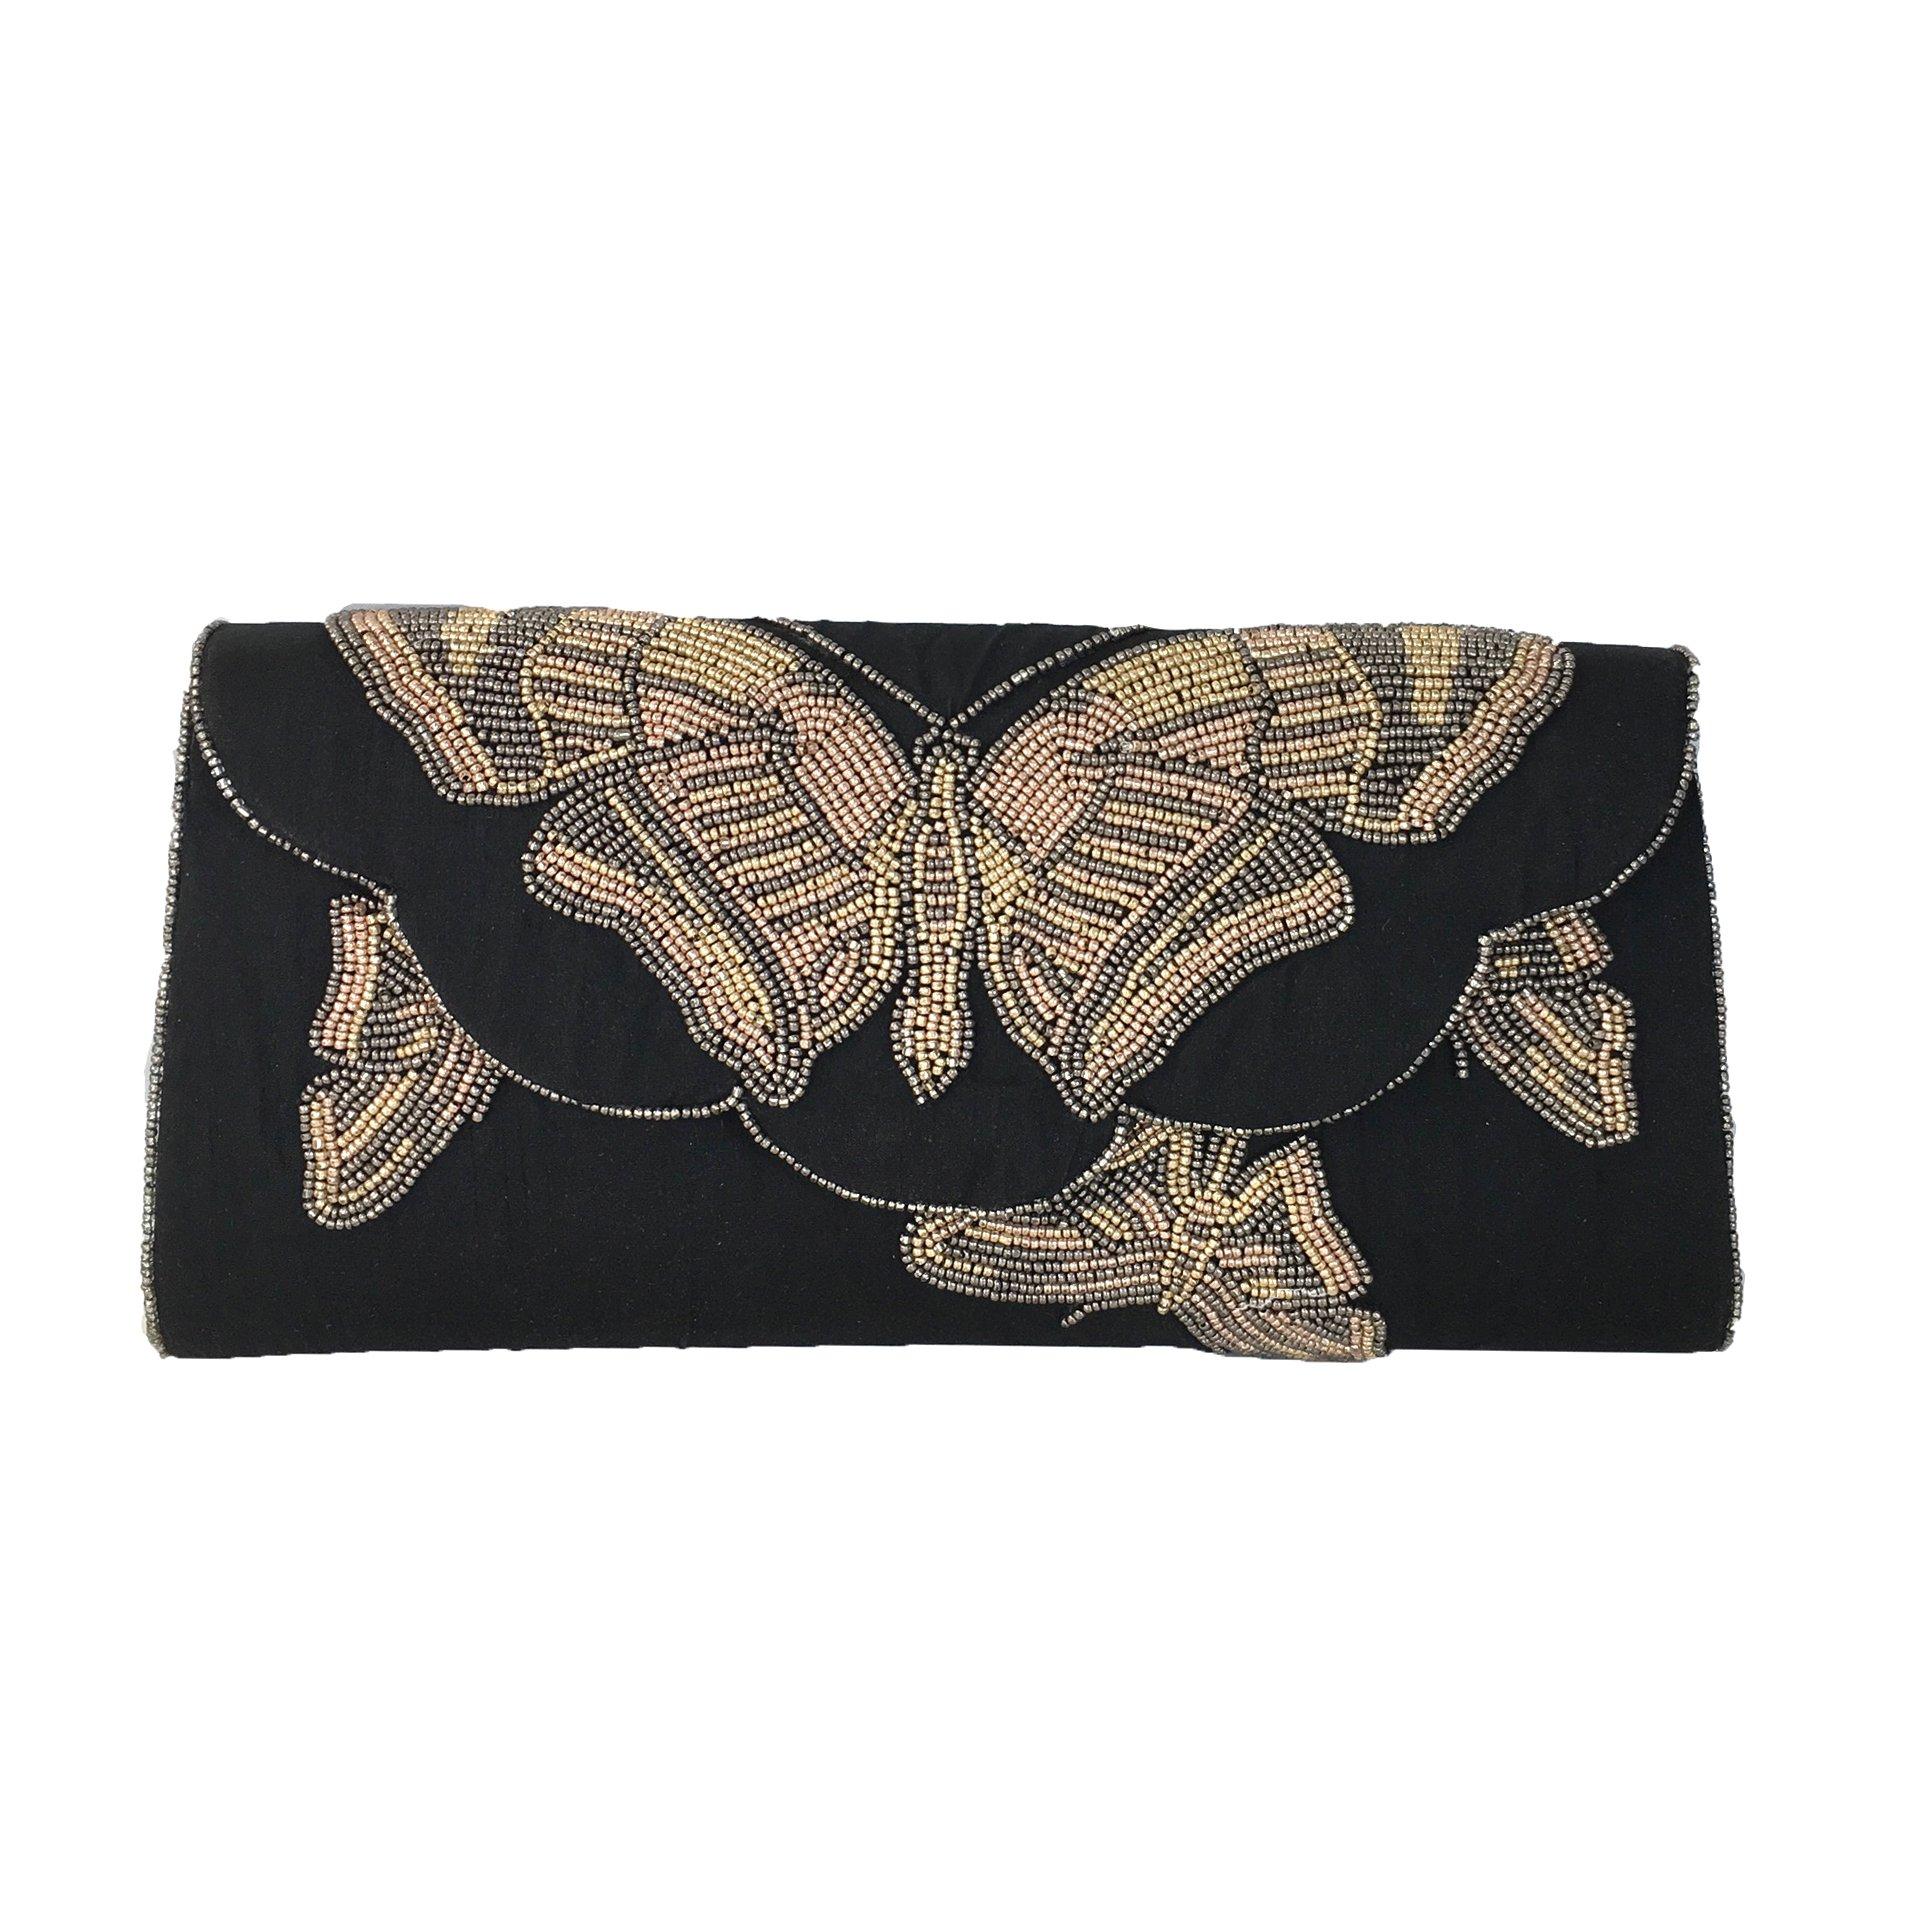 From St Xavier Beth Butterfly Beaded Clutch, Black Multi